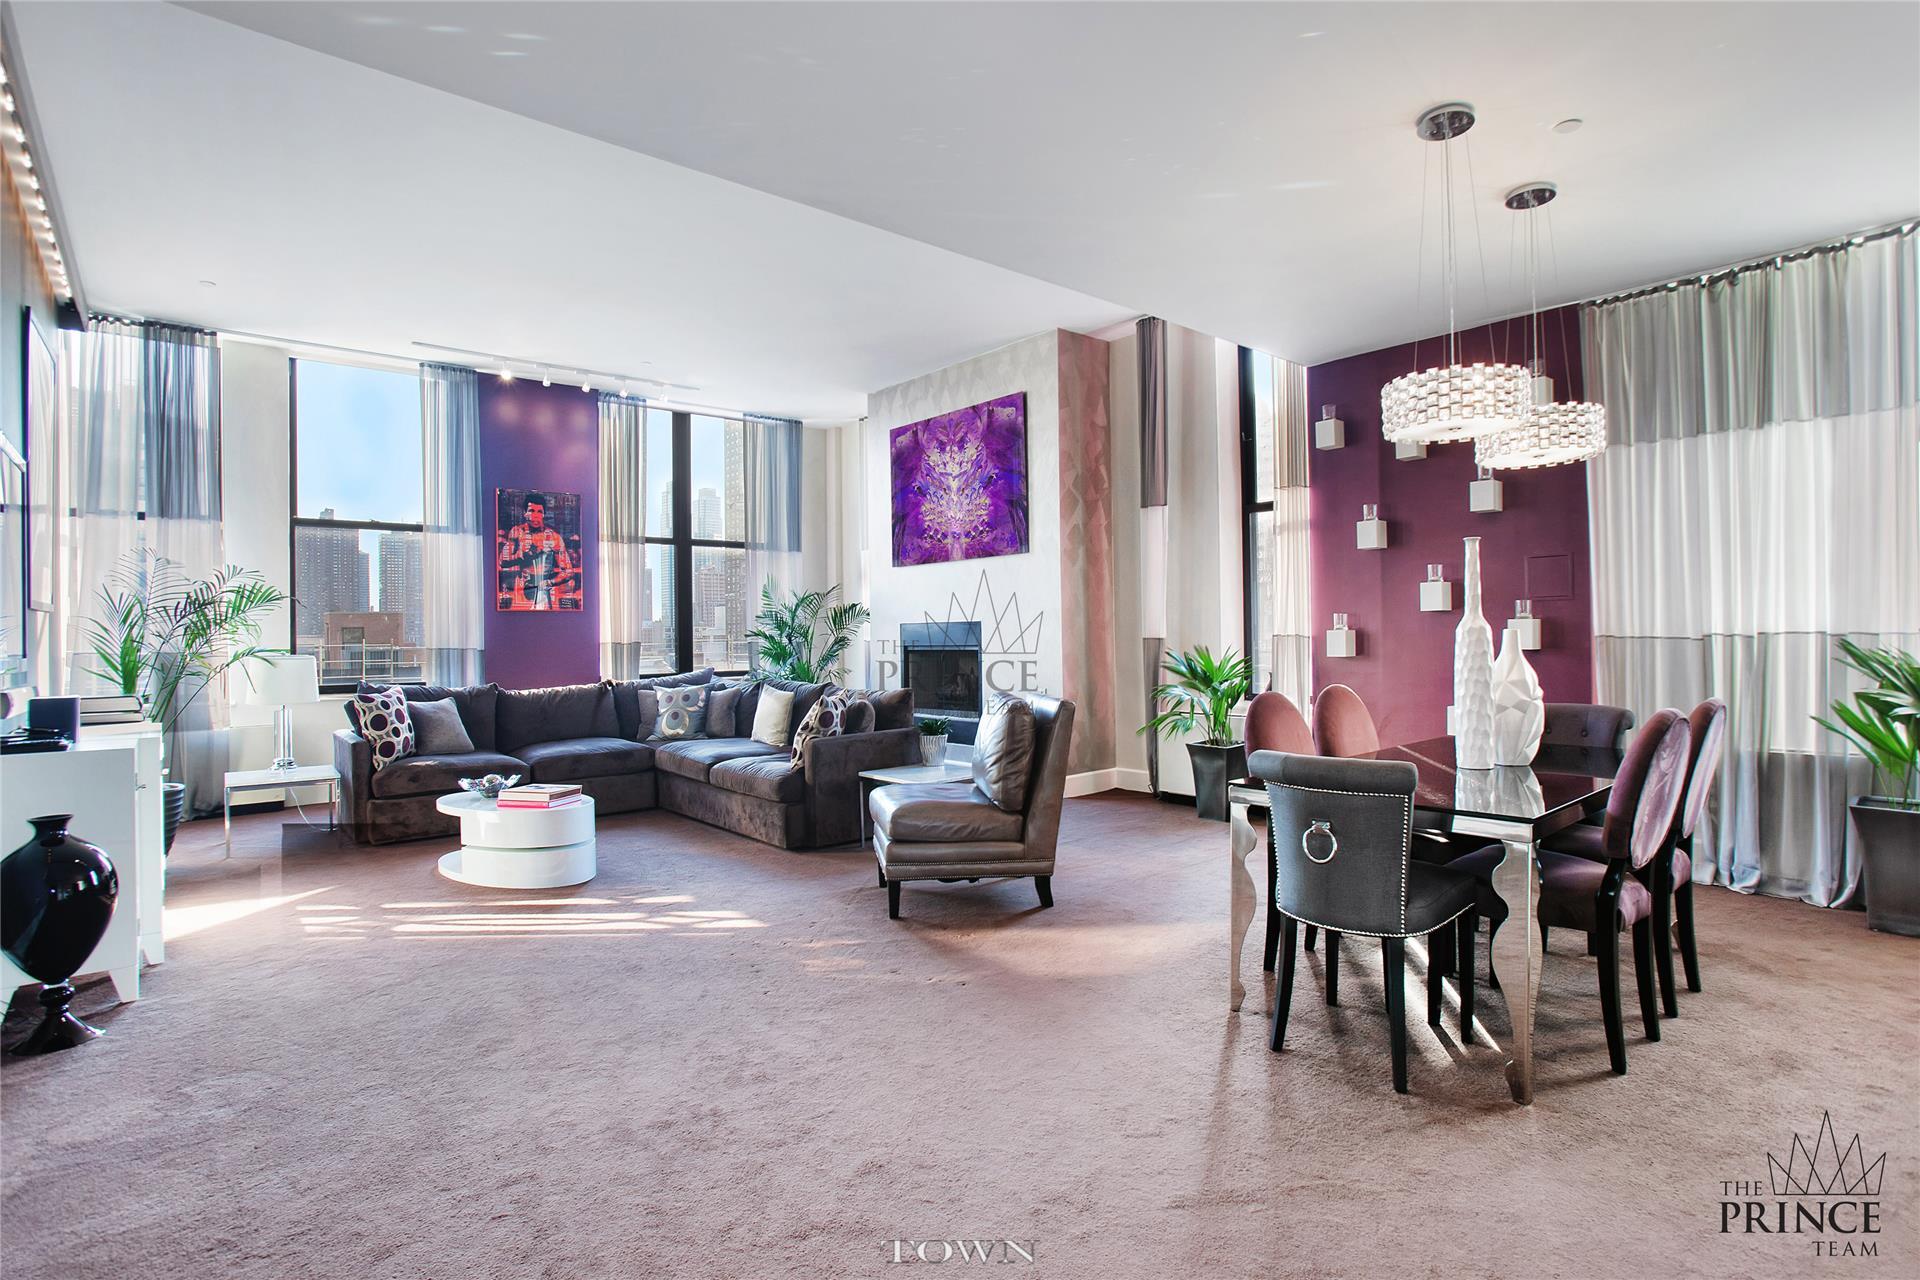 Condominium for Rent at Hit Factory Condominium, 421 West 54th Street, #ph-C 421 West 54th Street New York, New York 10019 United States